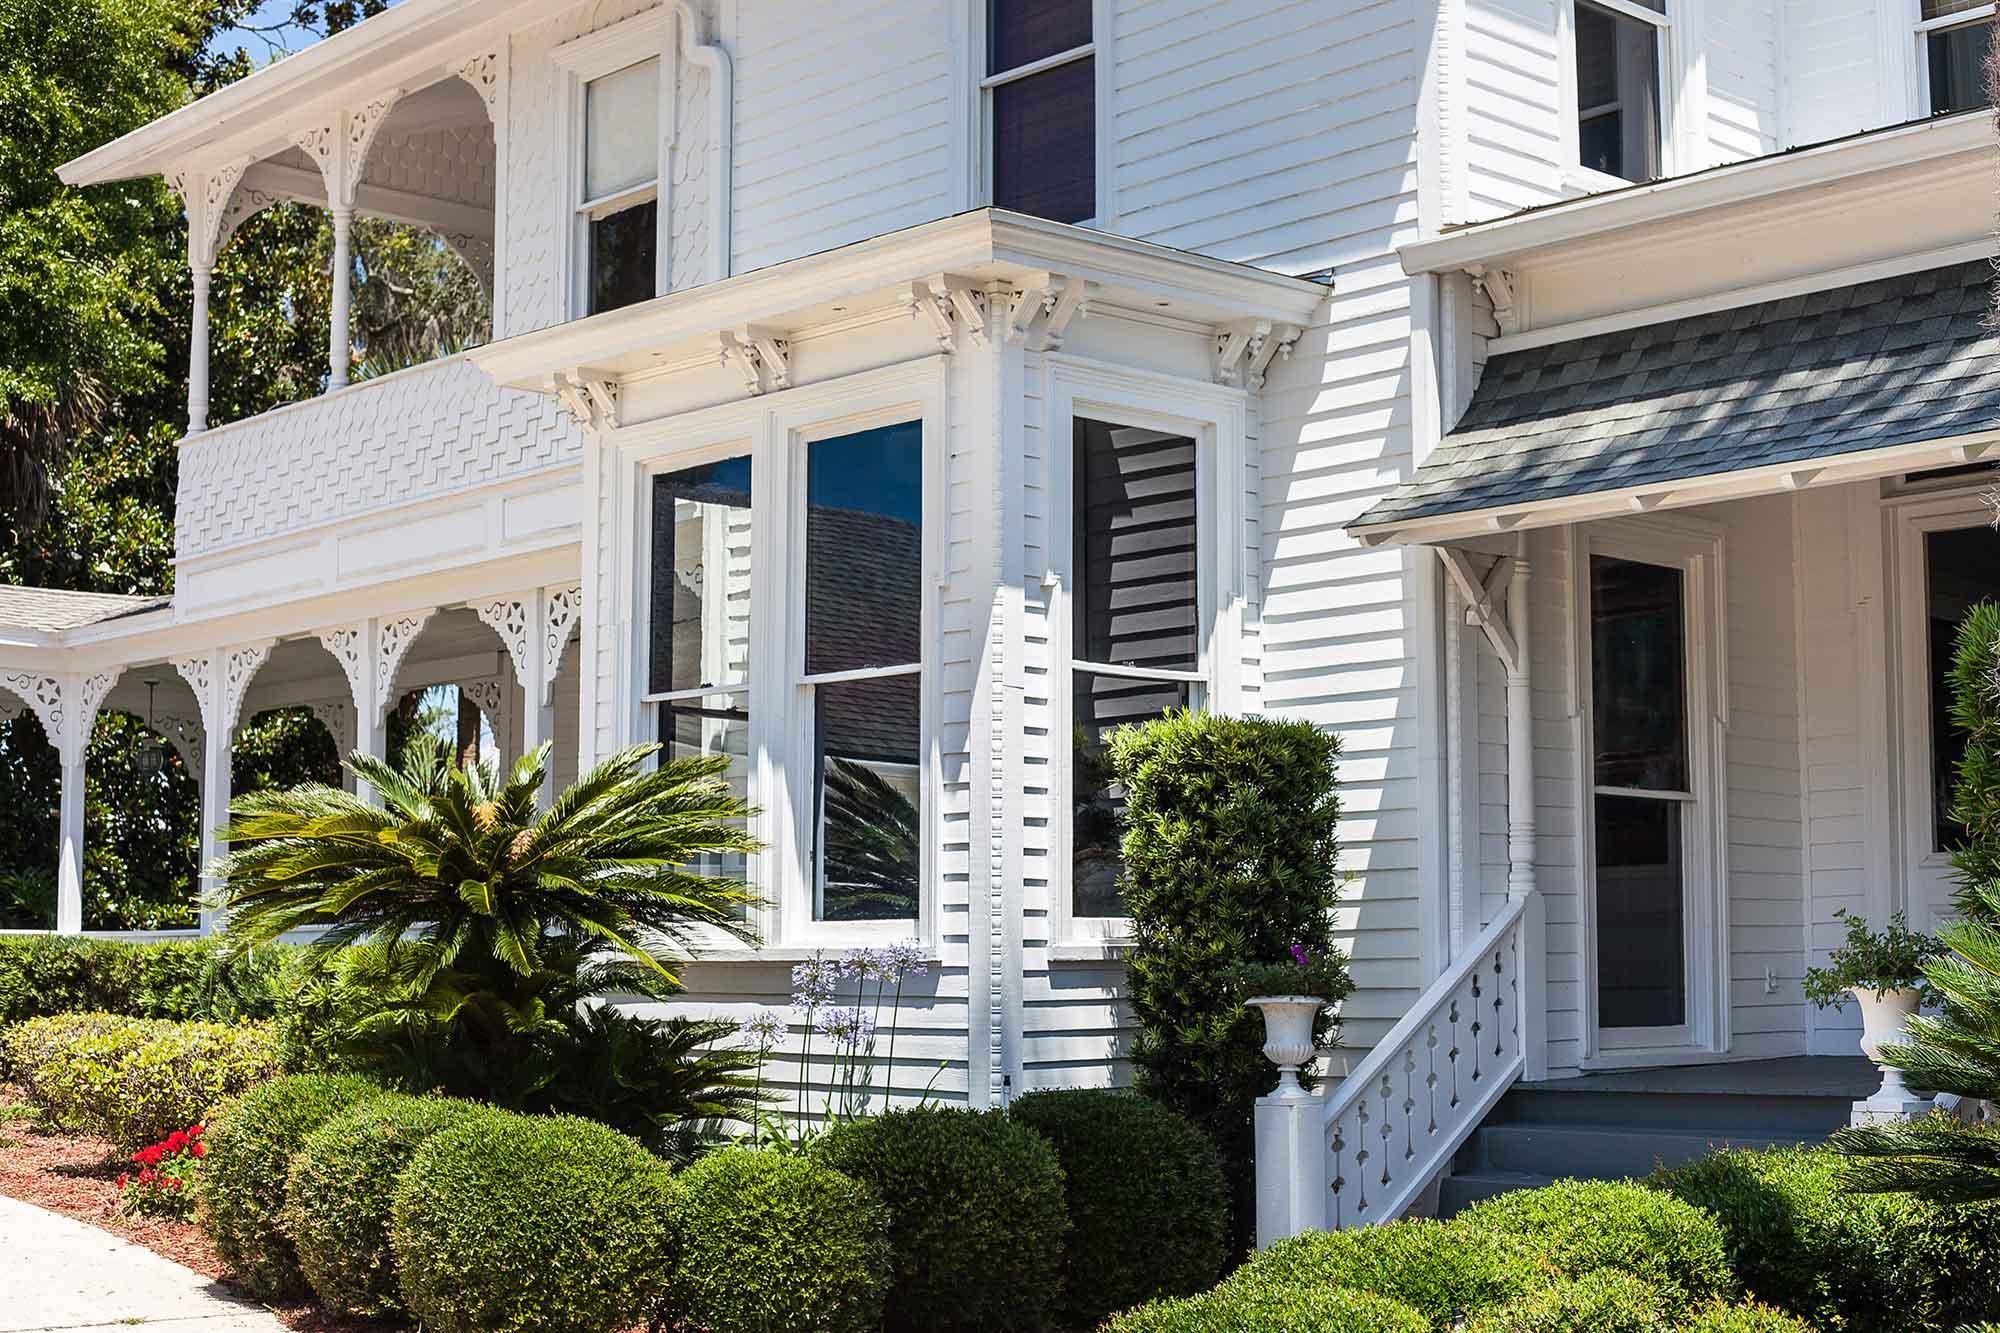 Better Home Improvement Announces Alternative Financing Plans for Home Improvements.